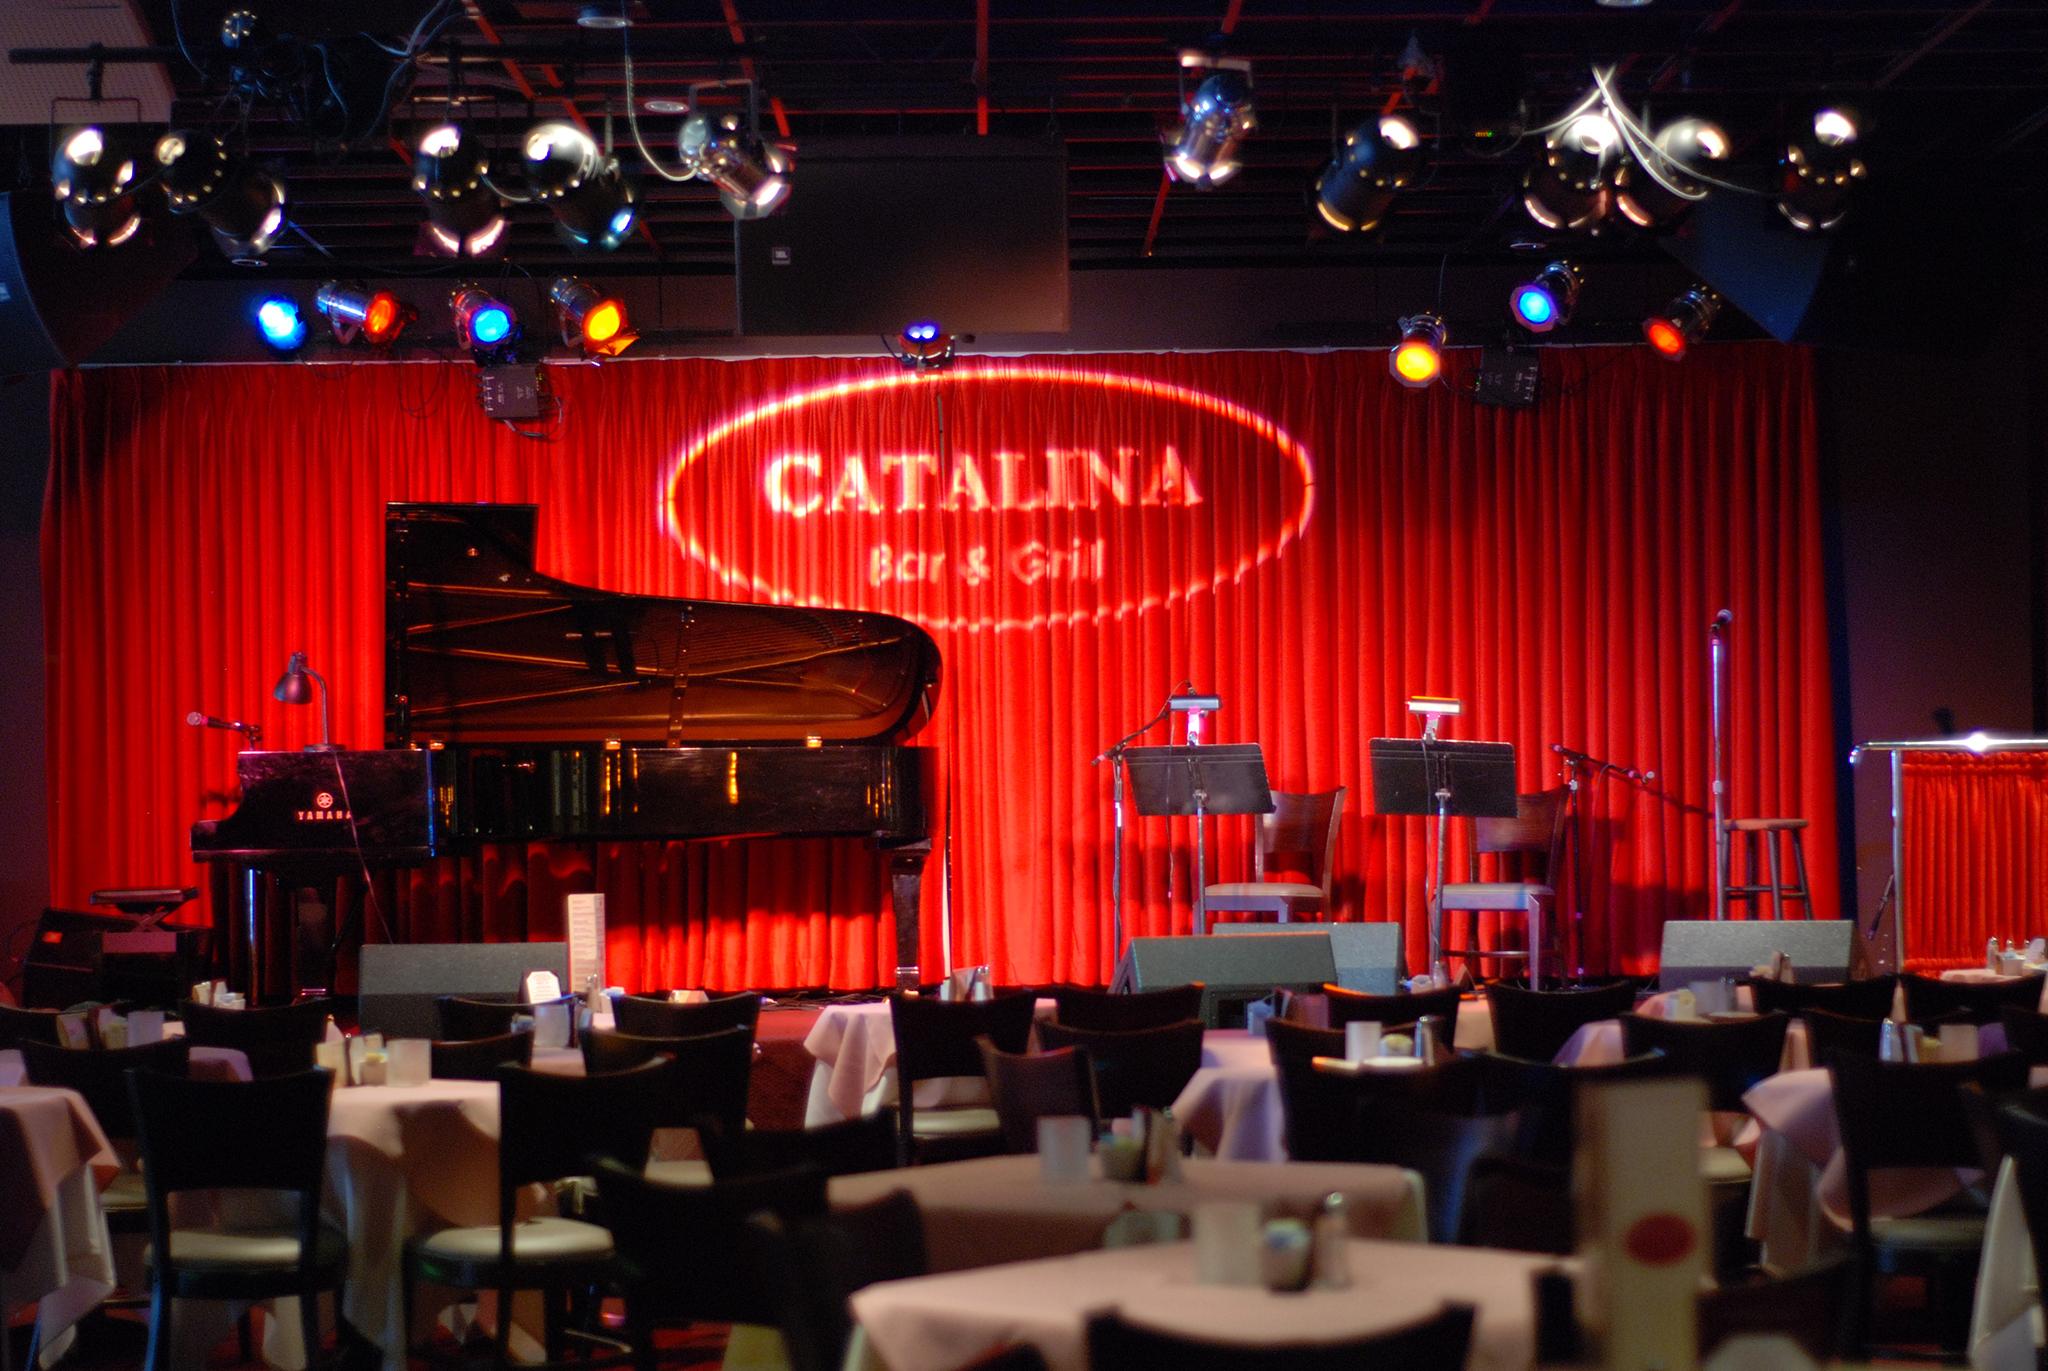 Catalina Bar & Grill | Restaurants In Hollywood, Los Angeles inside Catalina Bar And Grill Calendar